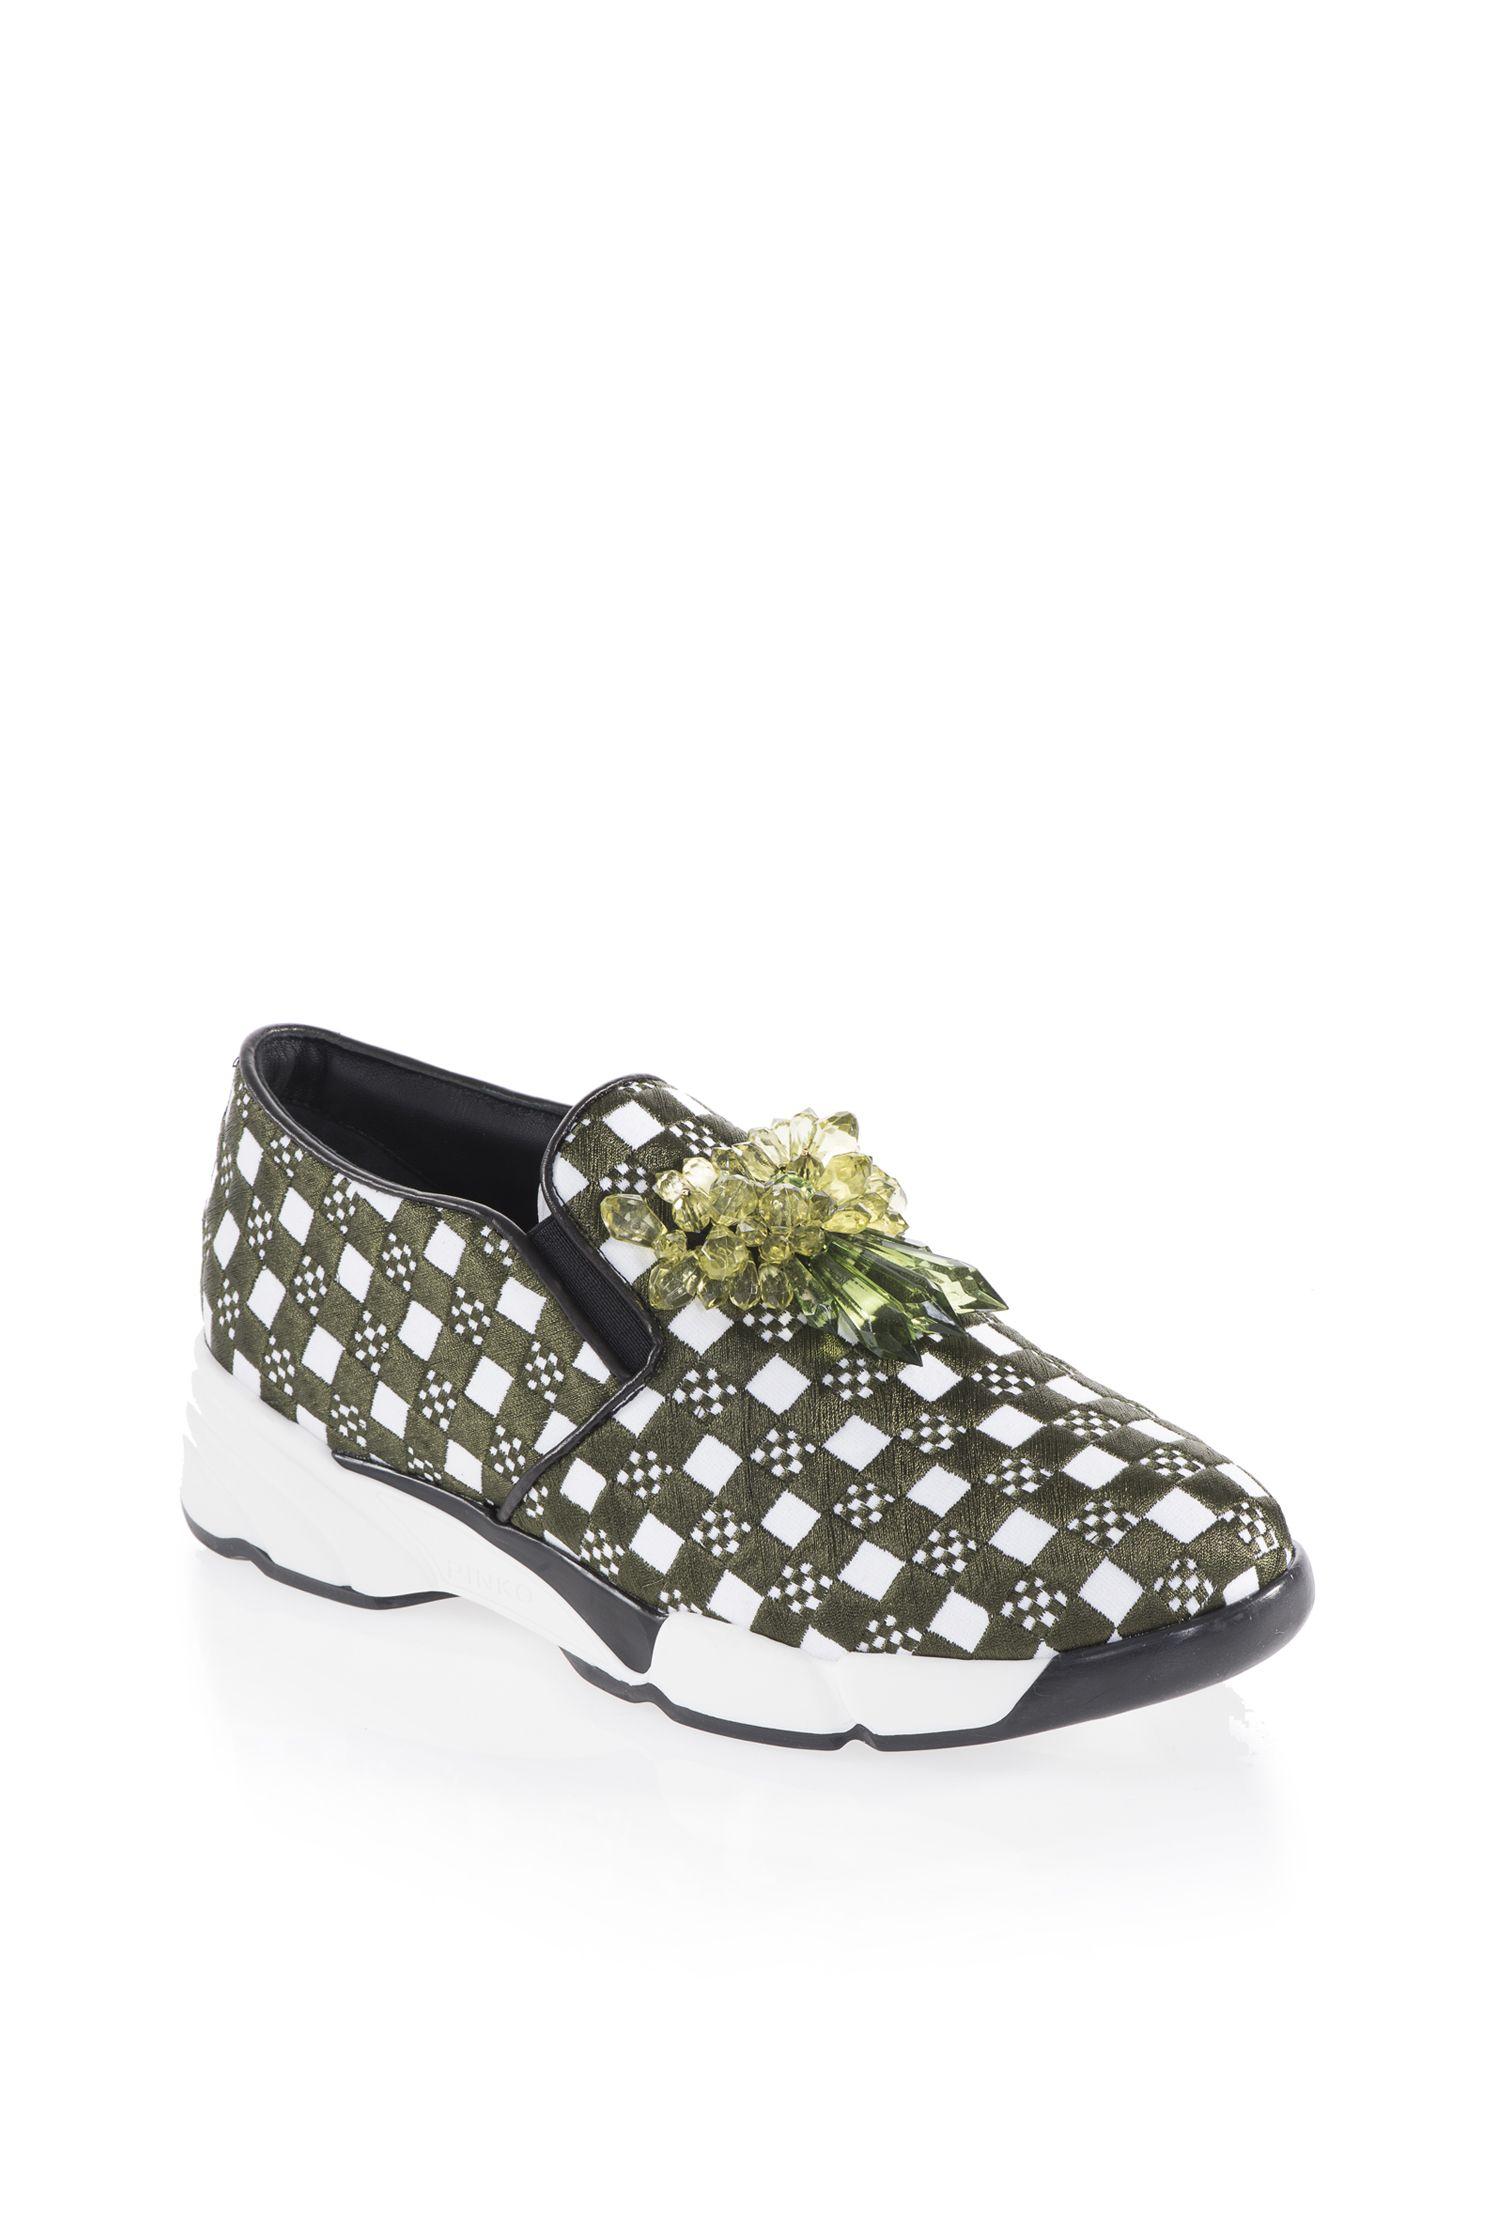 2016 Scarpe Dal Pinko Sneakers Rock Glamour Autunno Inverno qgwBavt a2138660d7c